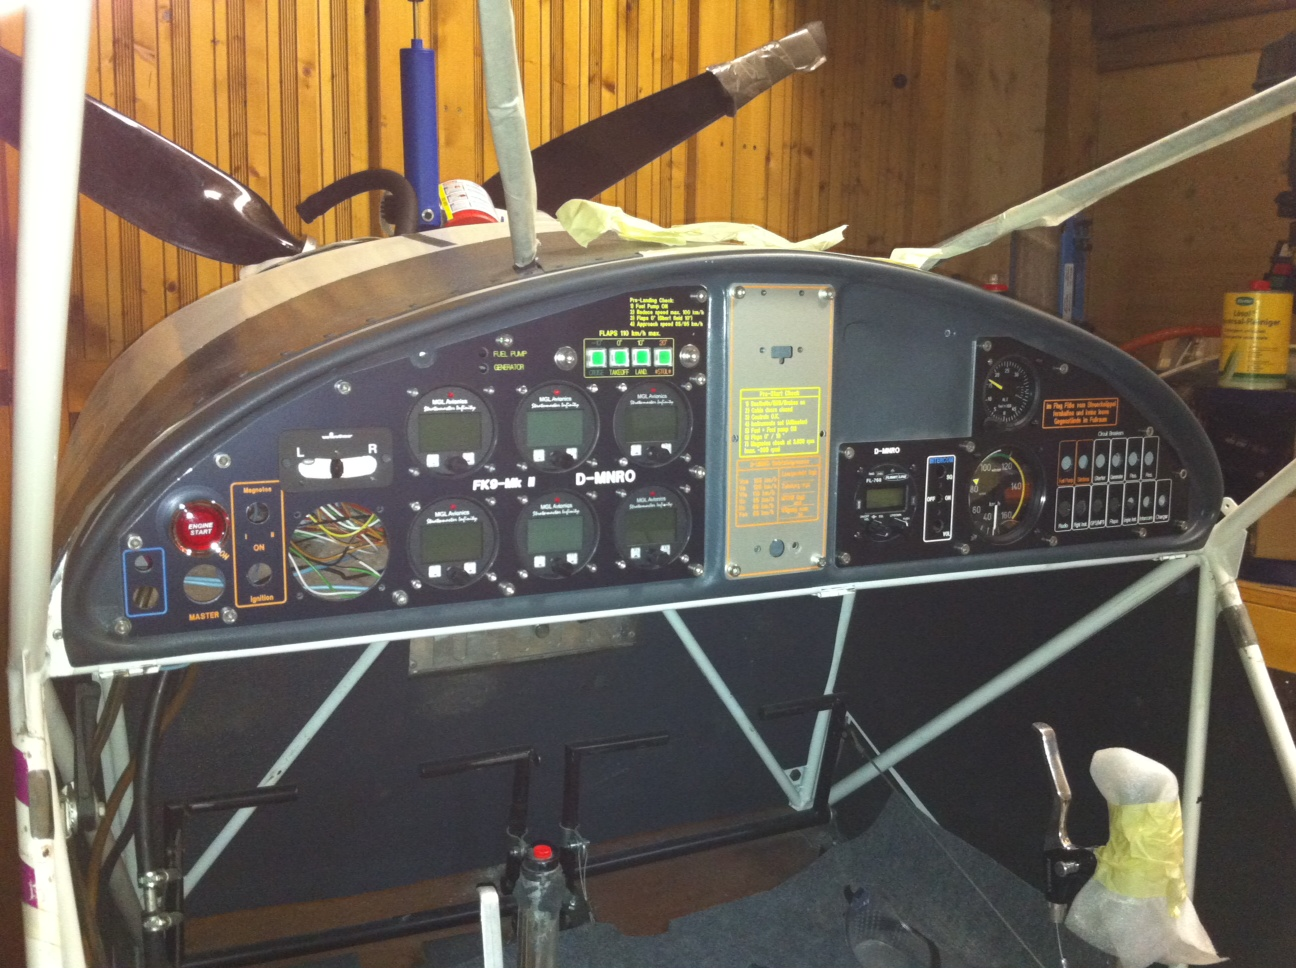 FK9 Mk1/2 Classic Ultraleichtflugzeug: Cockpit Panel fast fertig ...